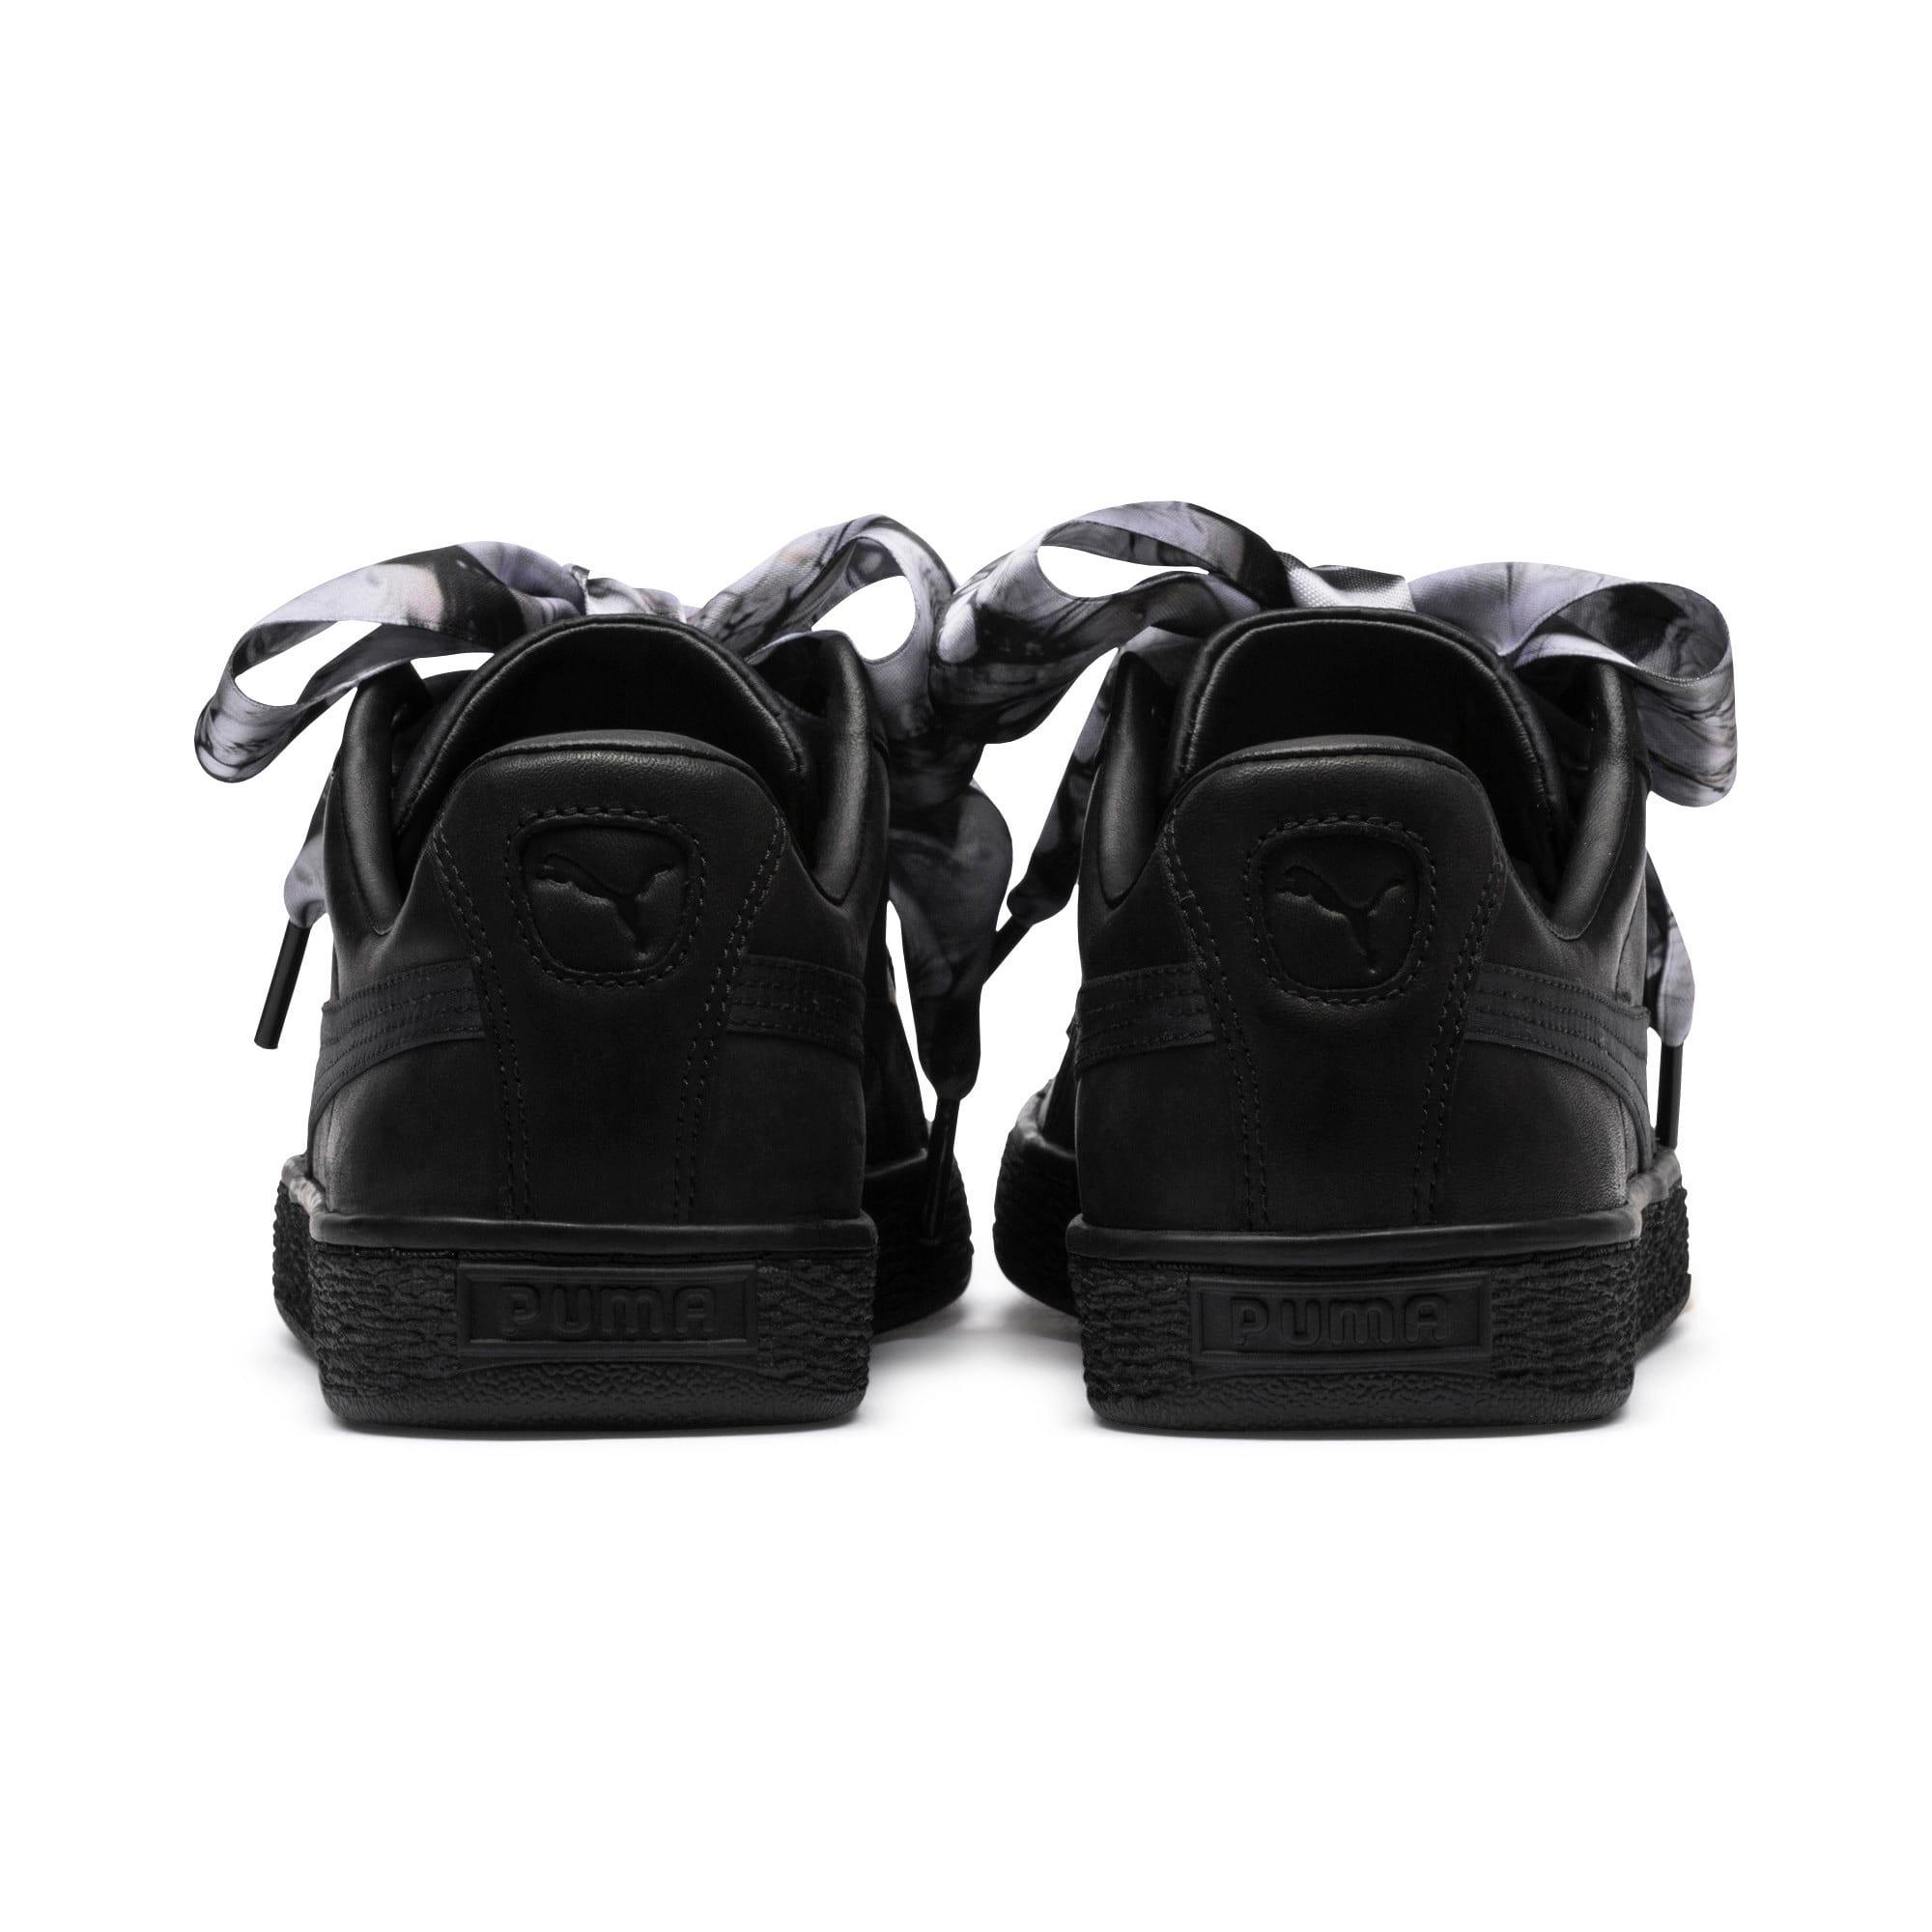 Thumbnail 4 of Basket Heart Mimicry Women's Sneakers, Puma Black-Puma Black, medium